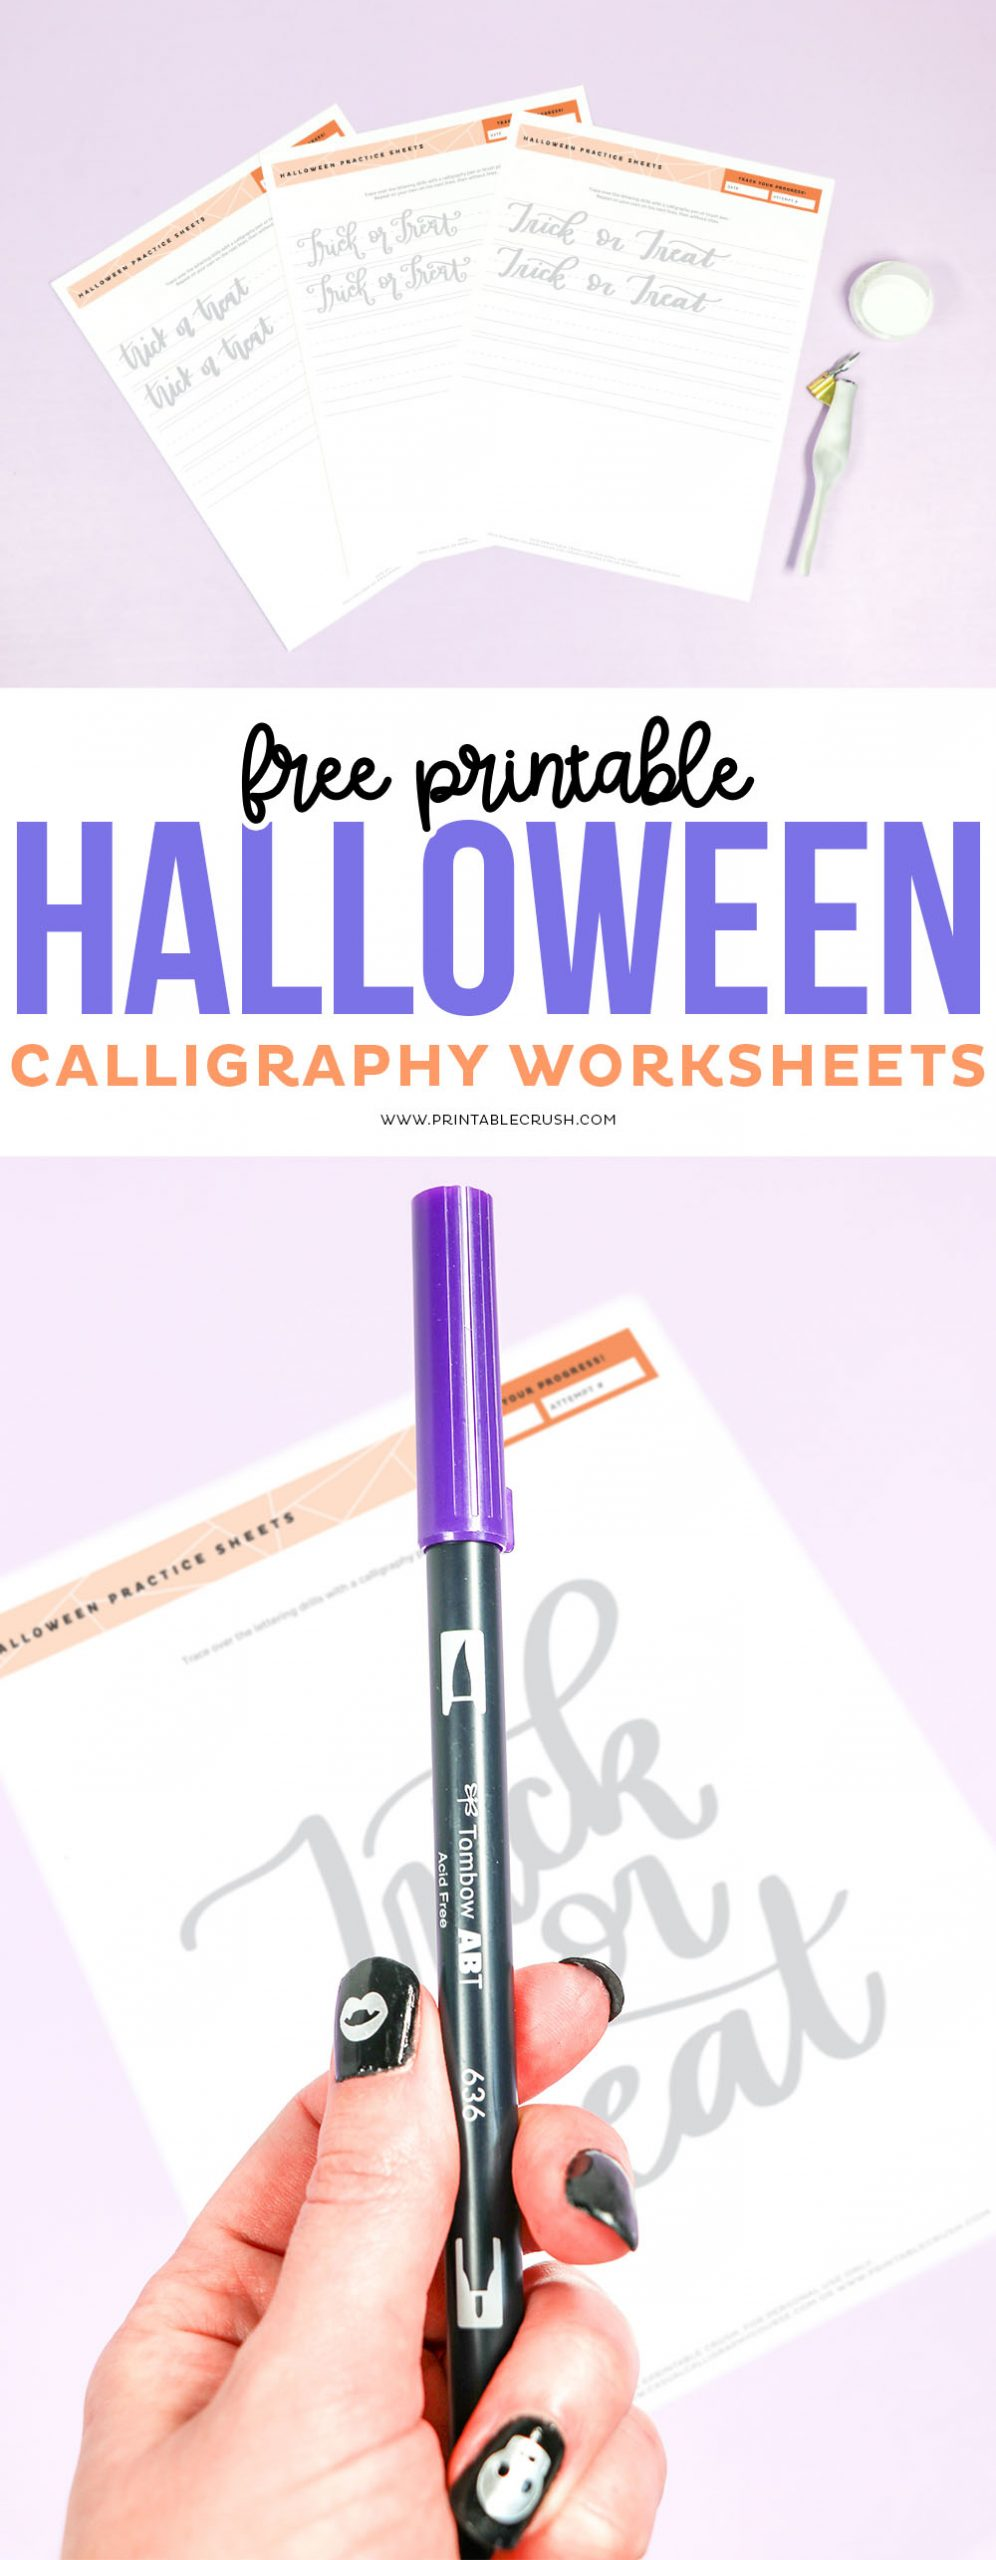 Free Halloween Calligraphy Practice Sheets - Printable Crush #calligraphy #handlettering #halloween via @printablecrush